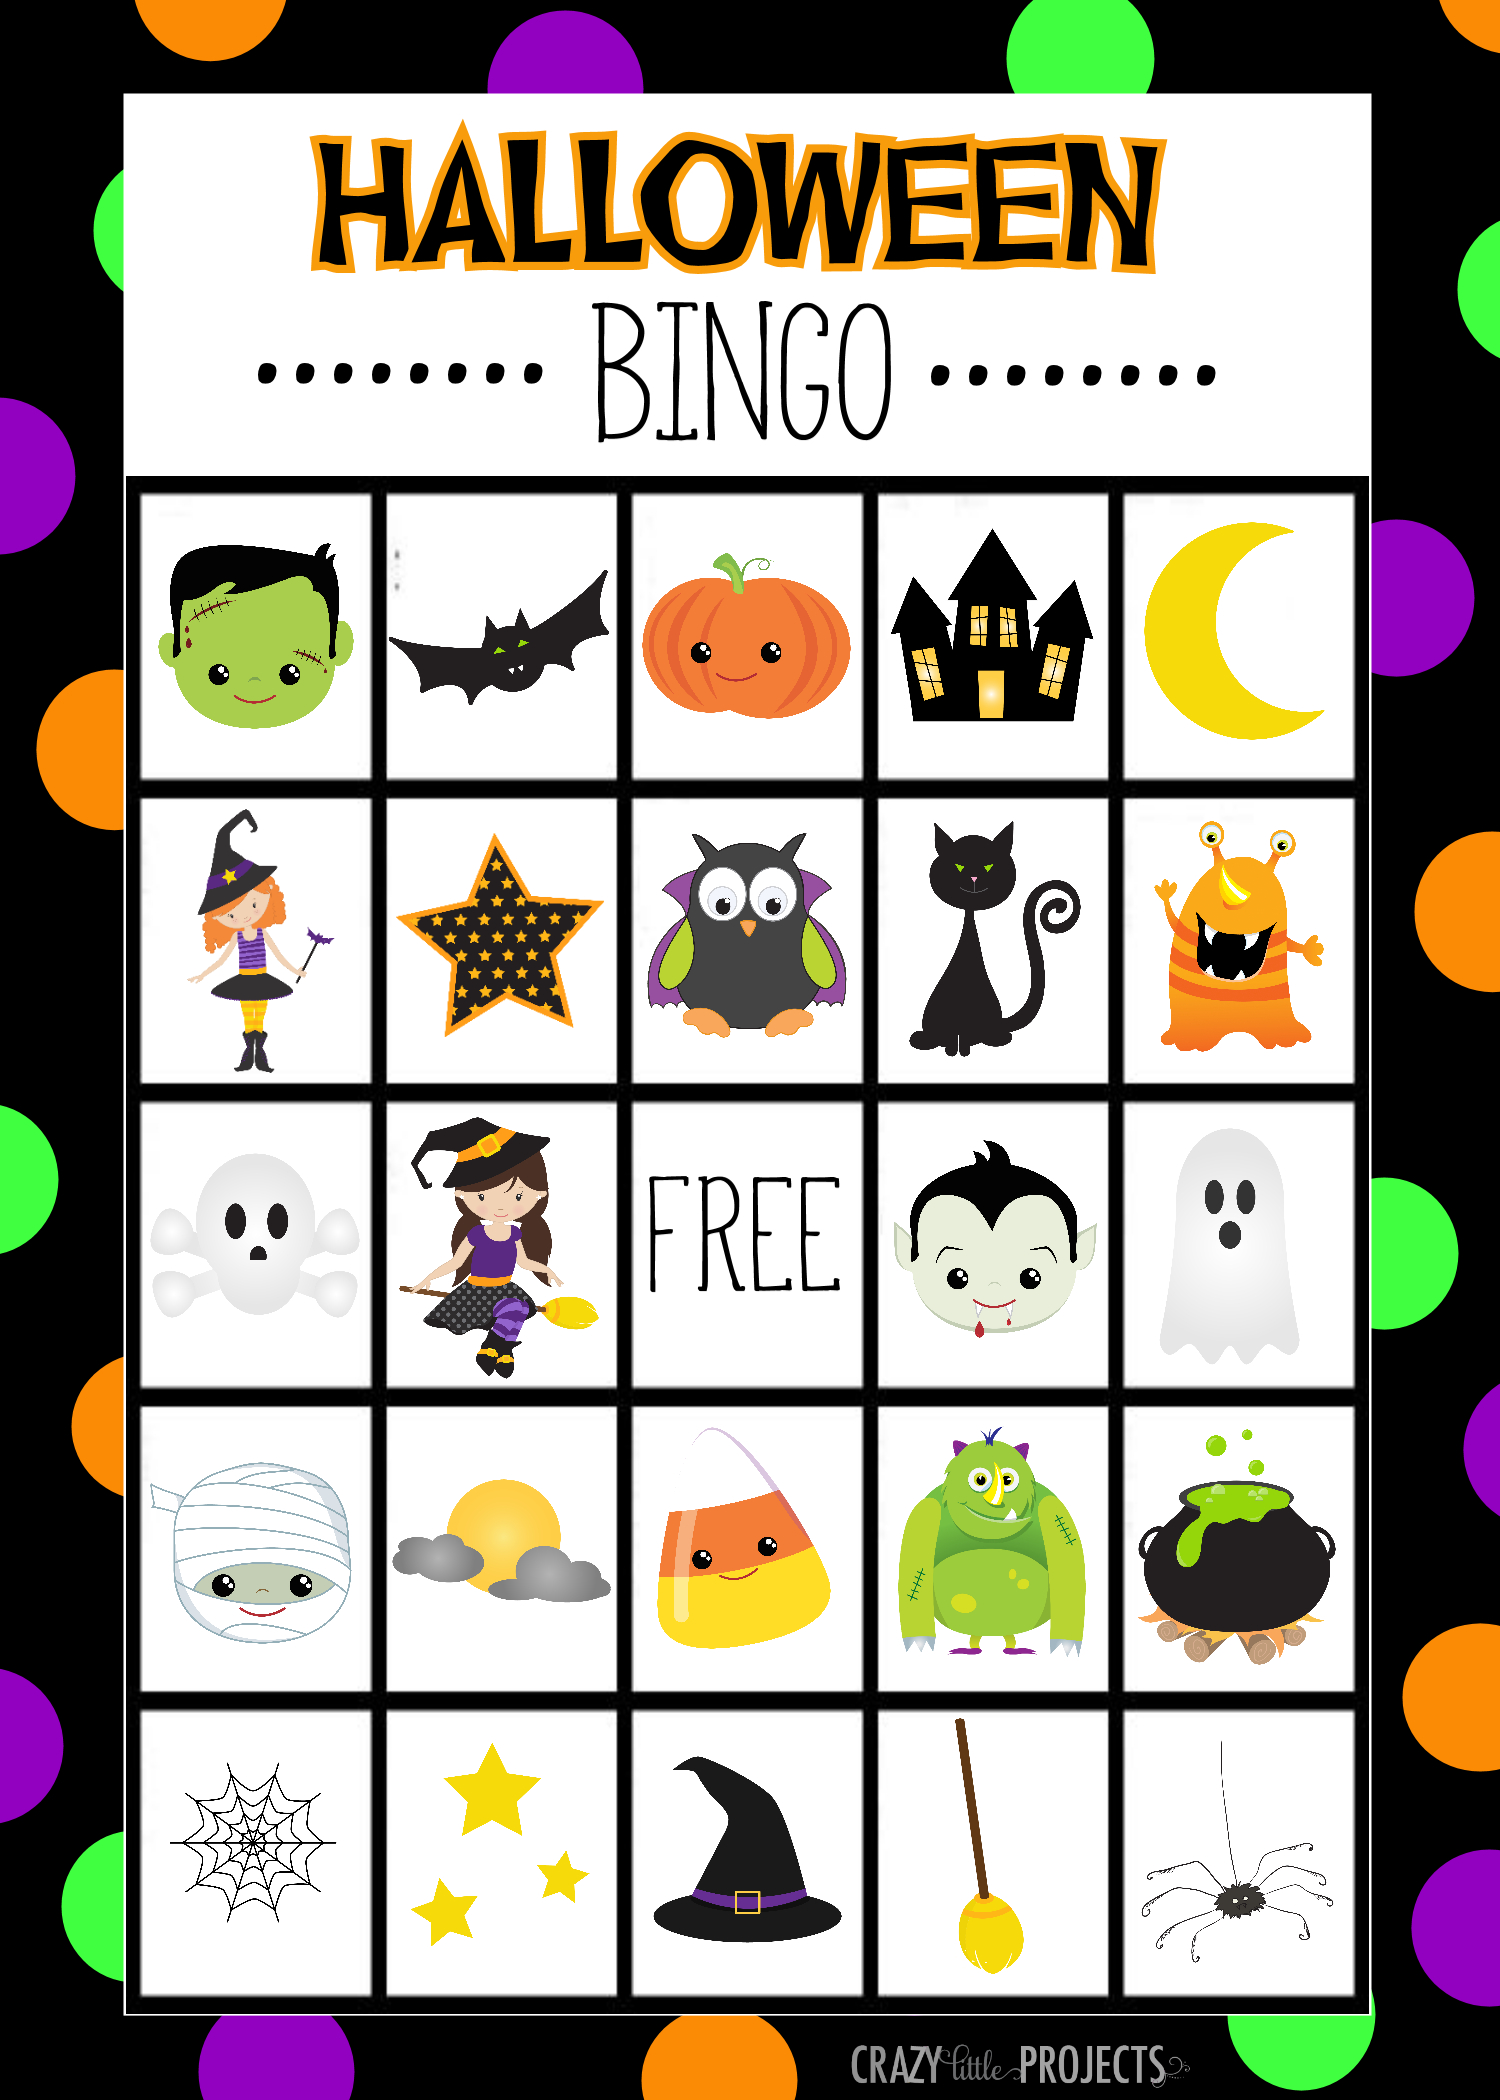 Halloween Bingo - Cute Free Printable Game - Halloween